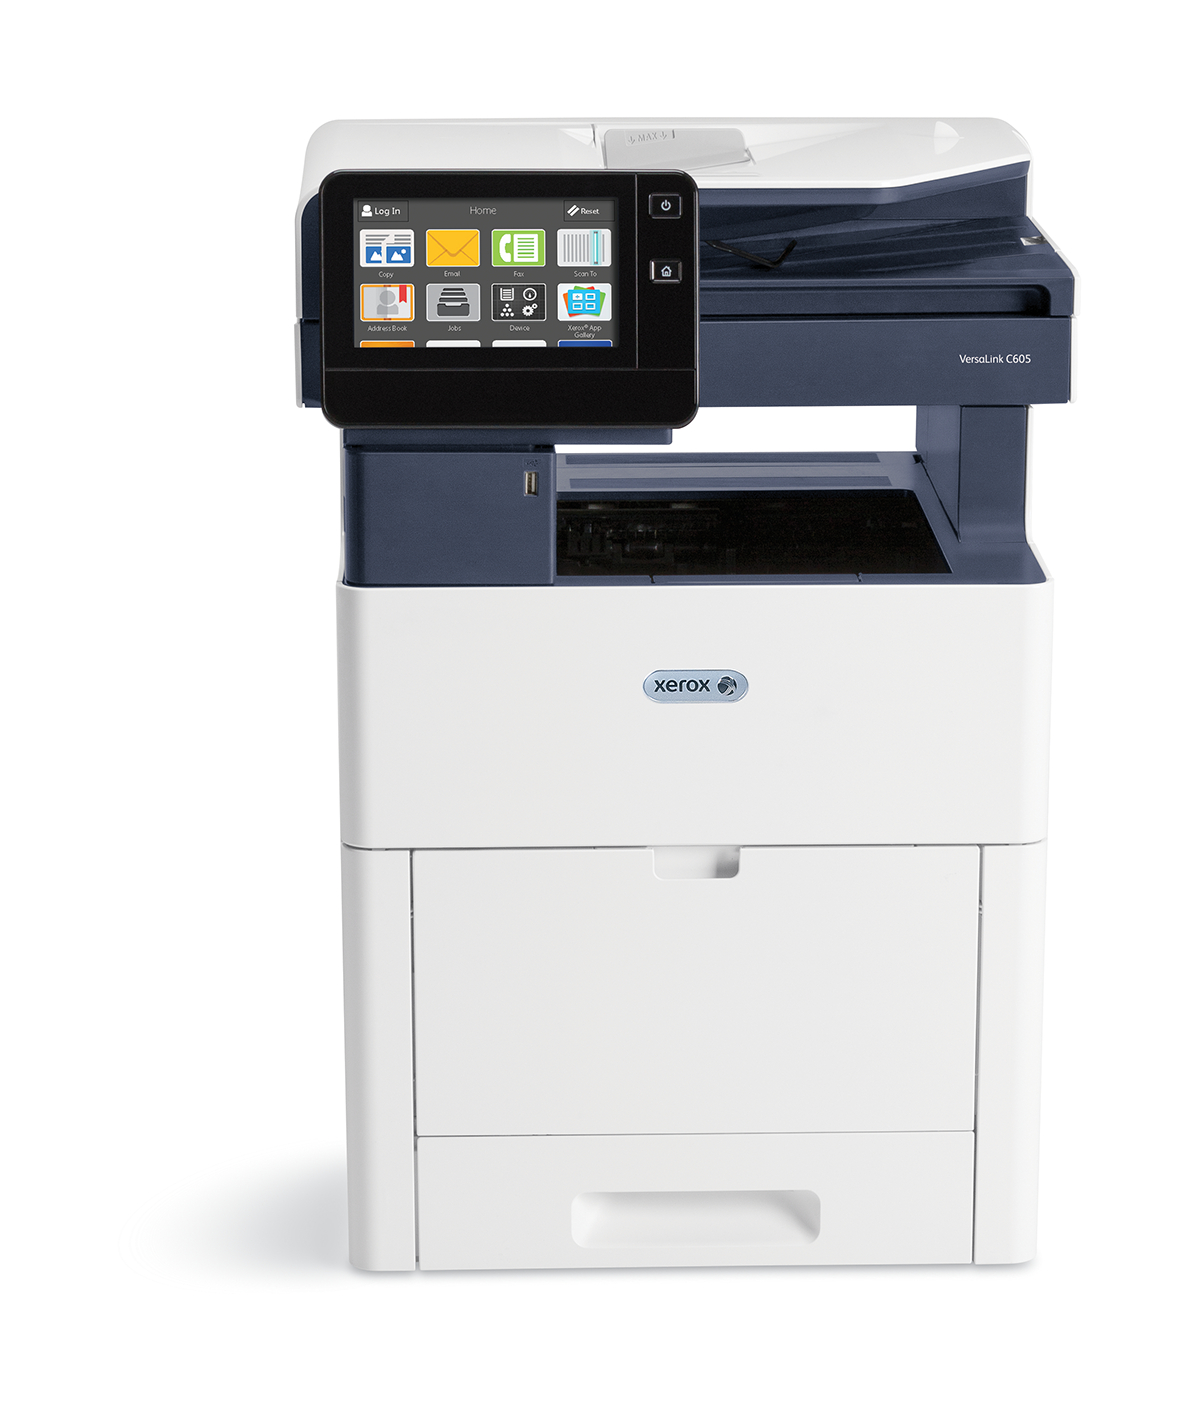 echipament Xerox PrimeLink